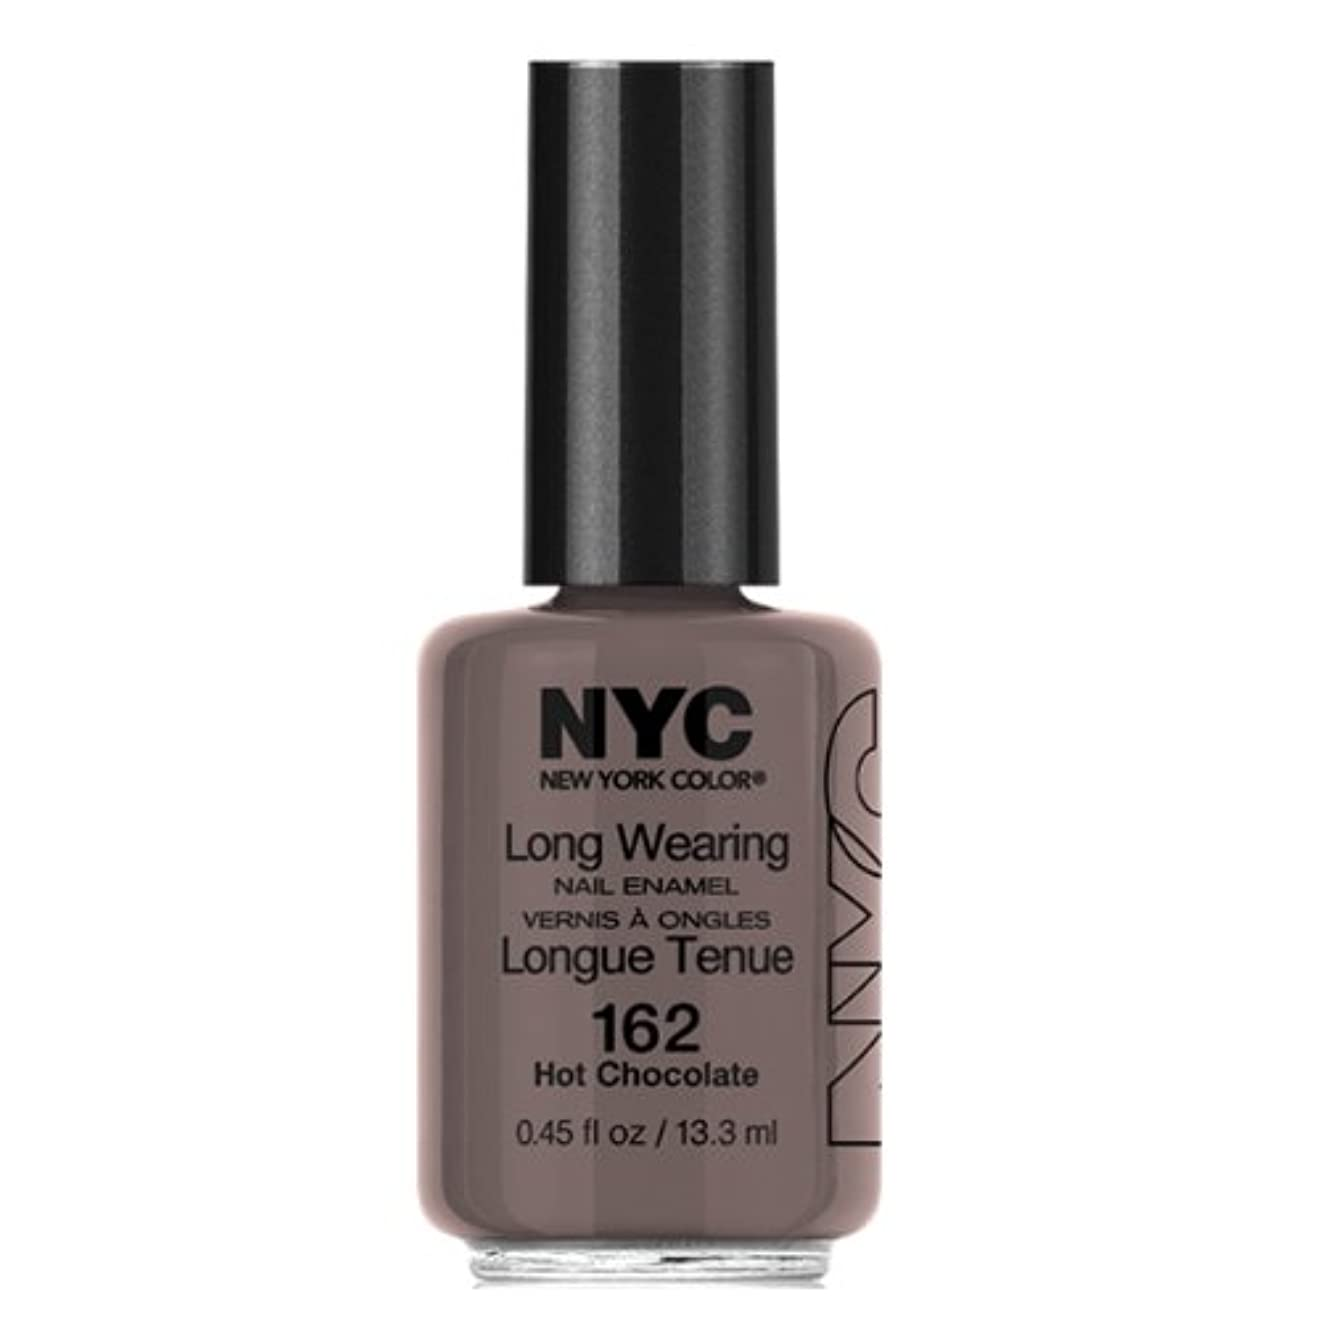 衣服動脈雇用者(6 Pack) NYC Long Wearing Nail Enamel - Hot Cholate (並行輸入品)